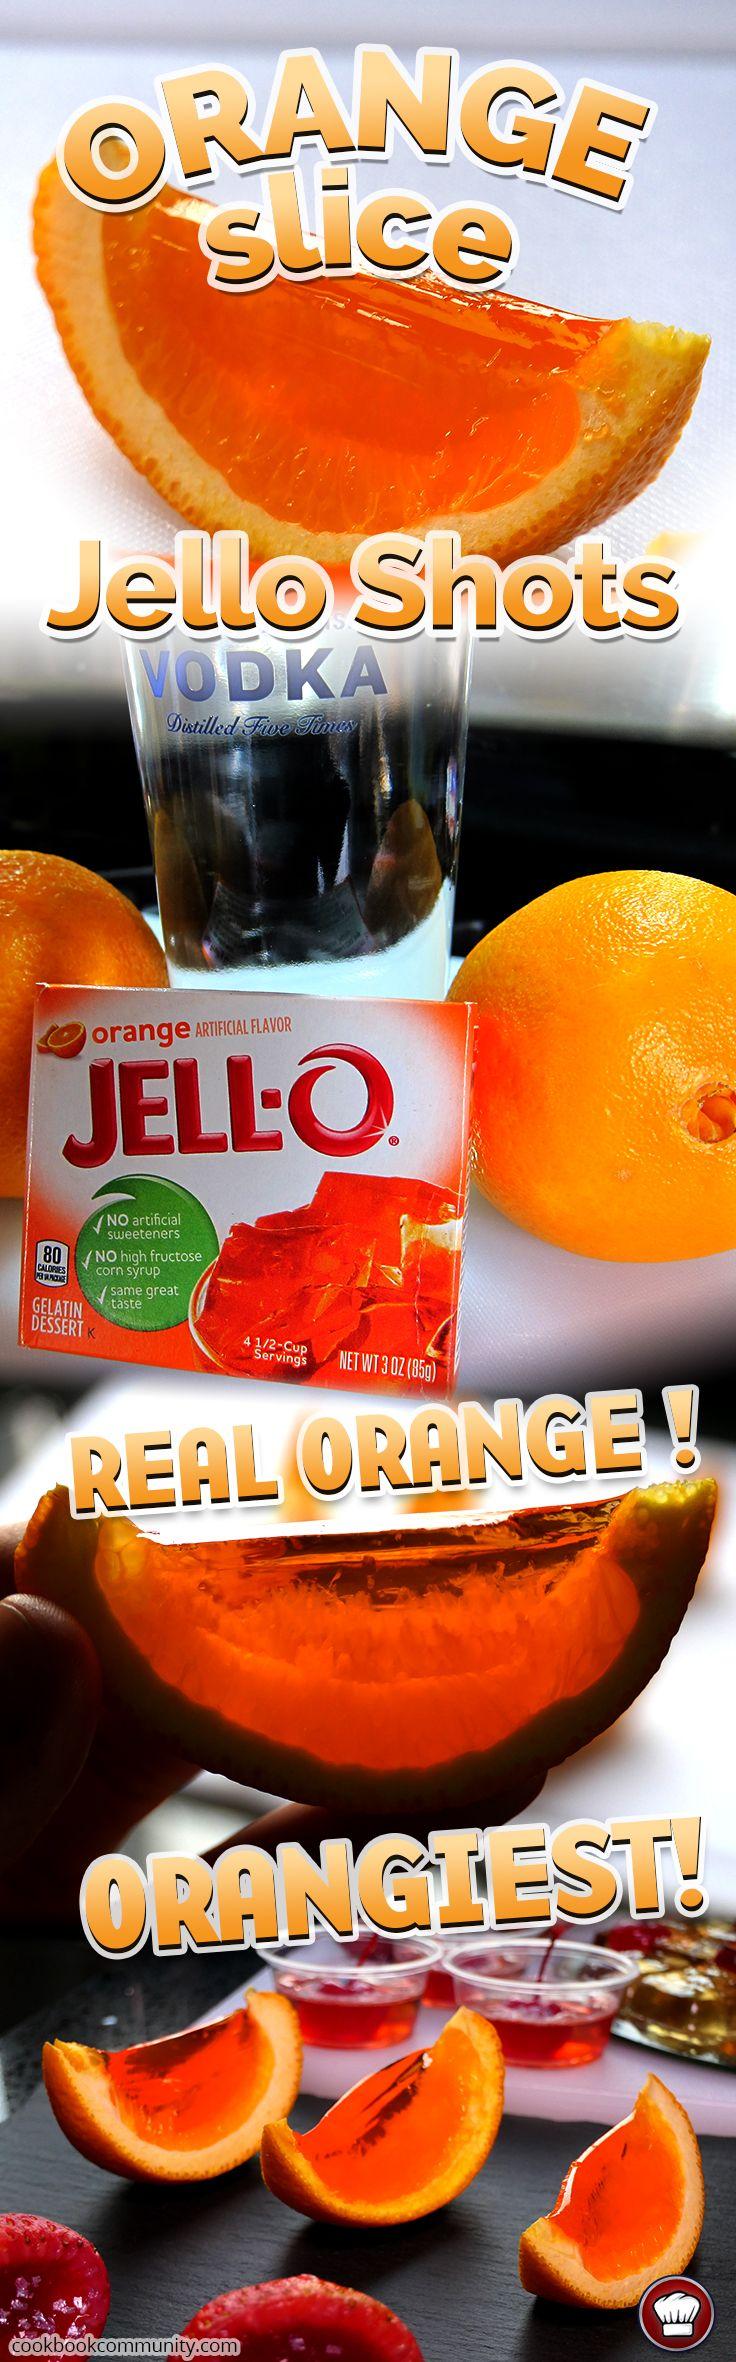 ORANGE SLICE JELLO SHOTS - Real orange bits in this jello shot make it better than any other!